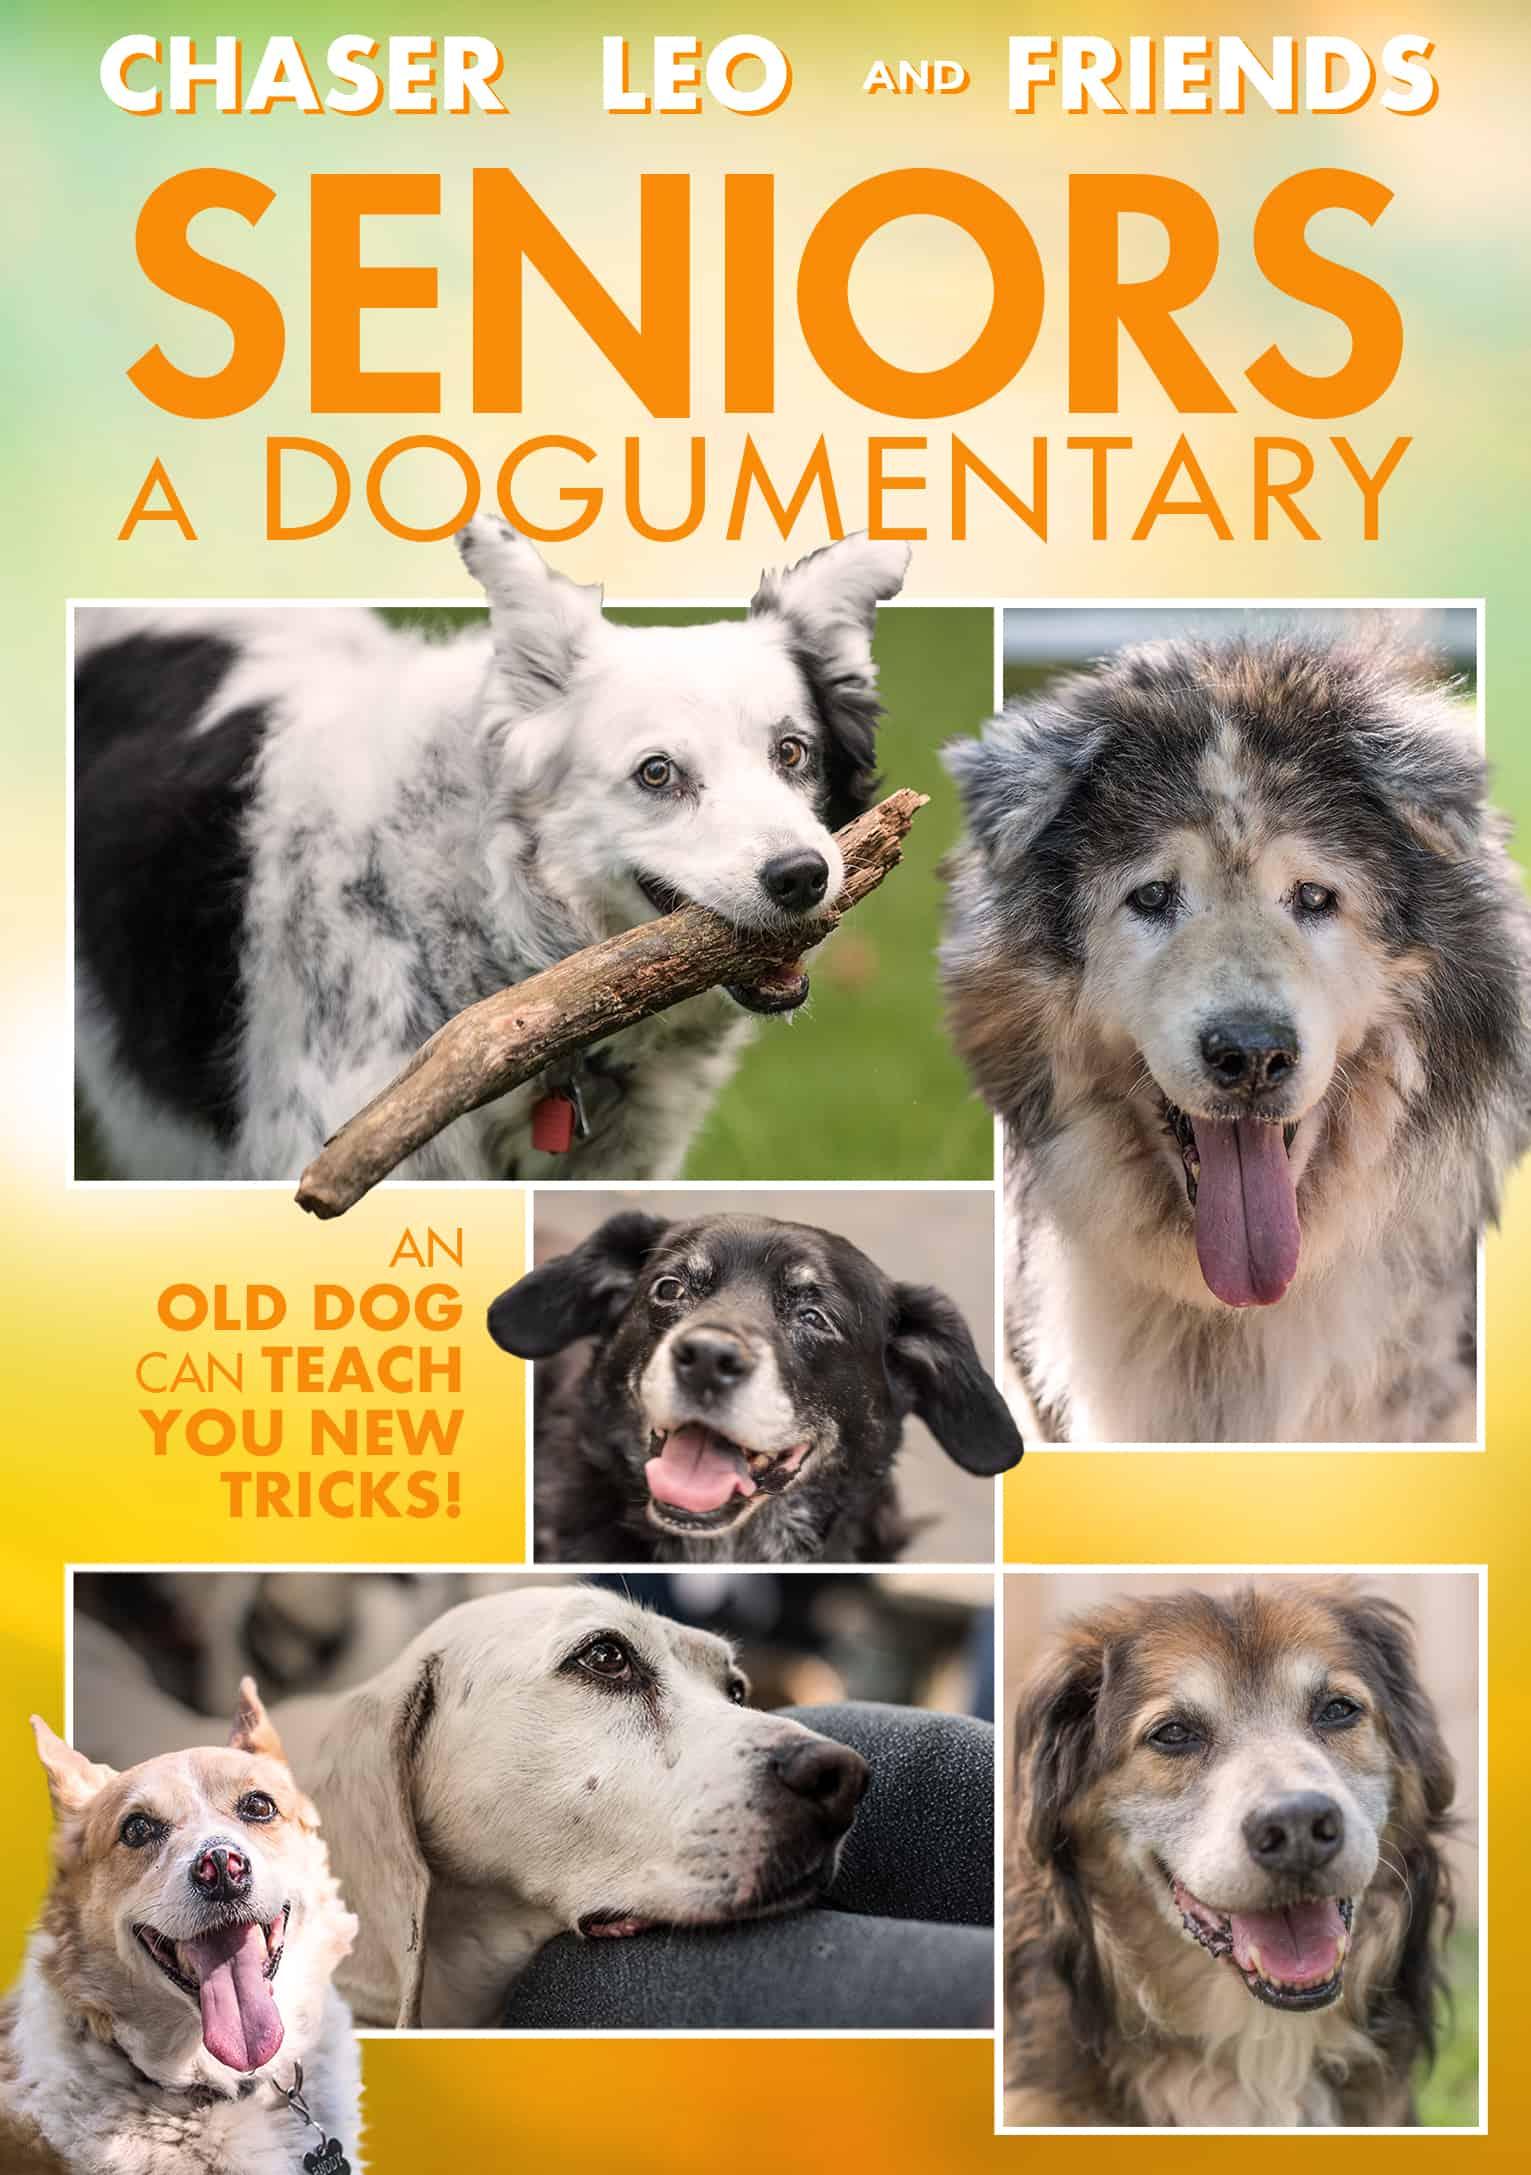 seniors a dogumentary september 29th